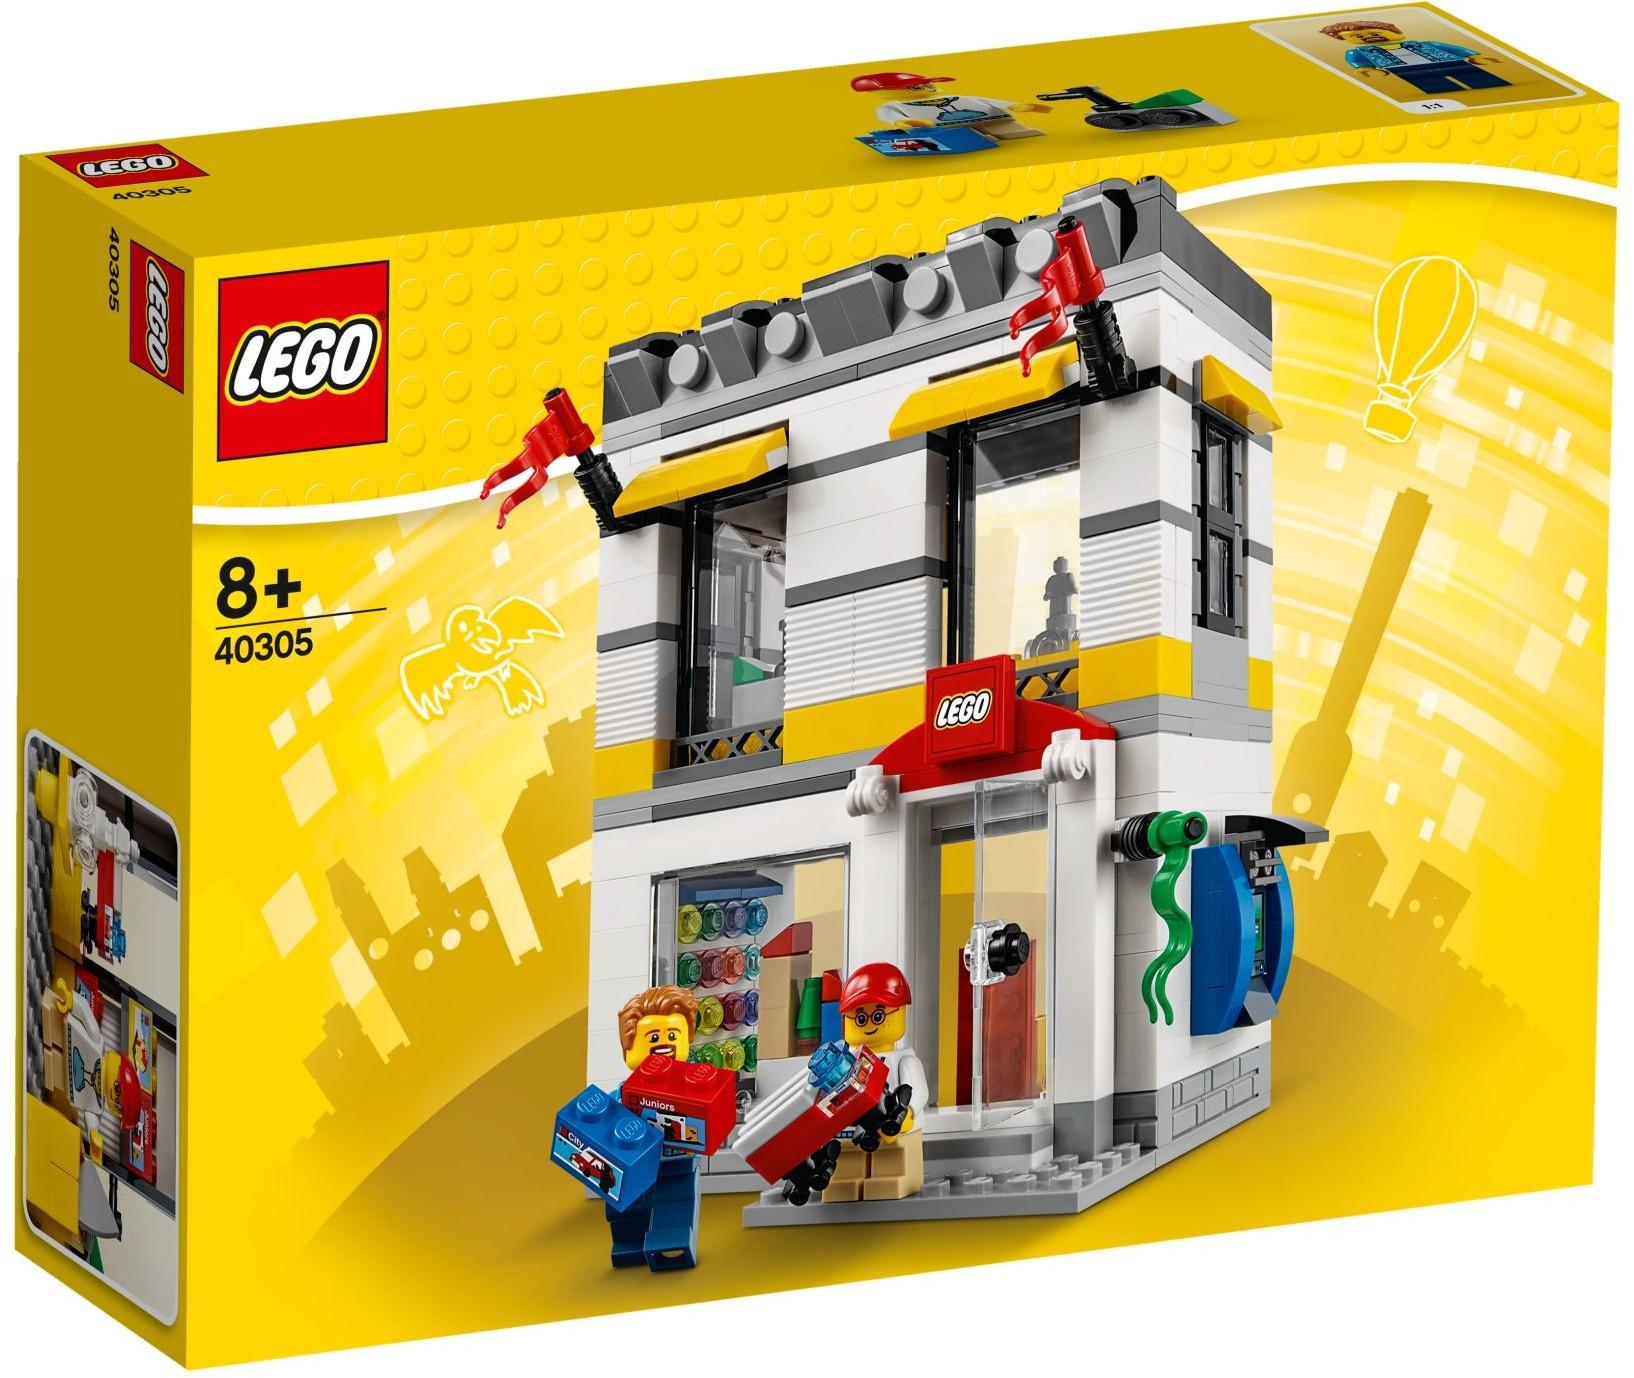 40305 - LEGO Brand Store